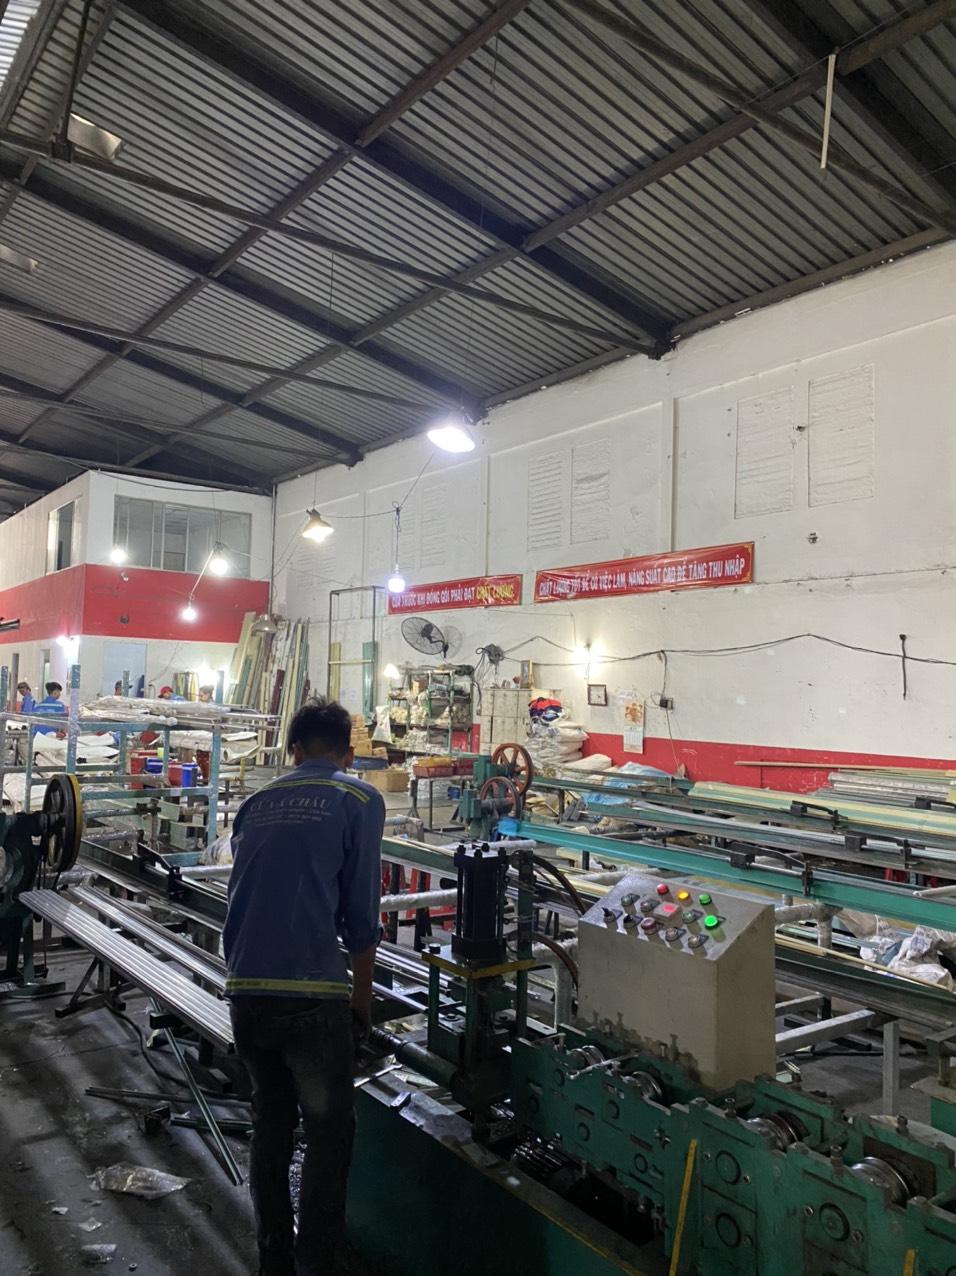 Máy móc sản xuất cửa kéo, cửa cuốn